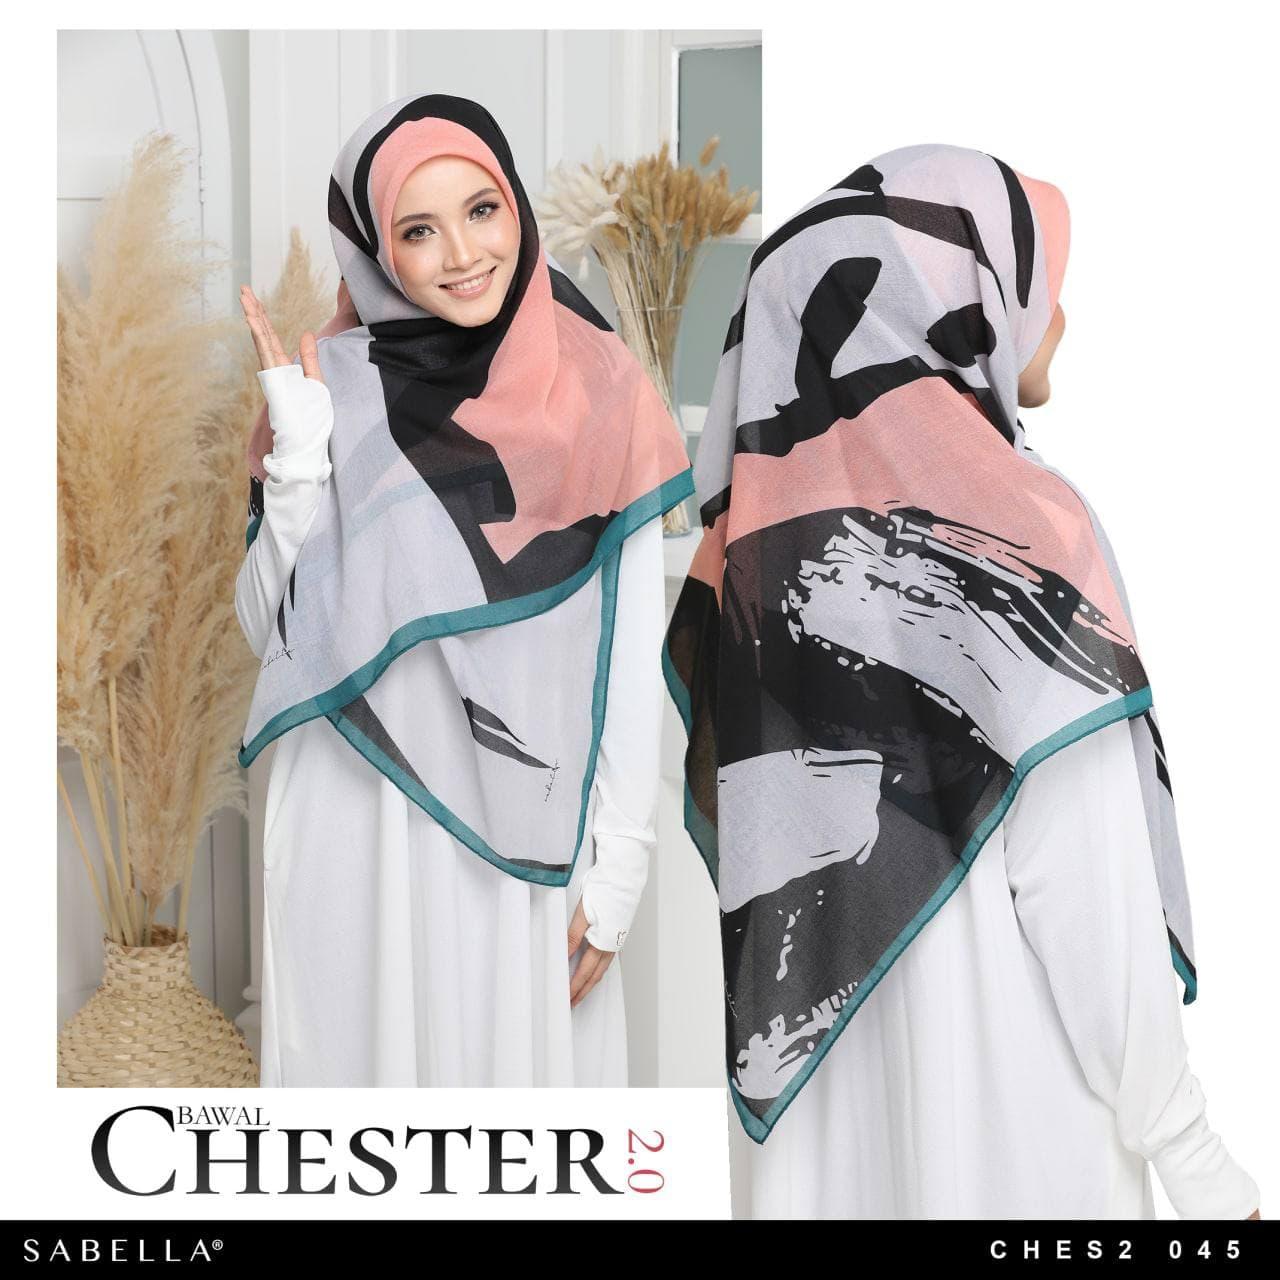 Bawal Chester (50) 045